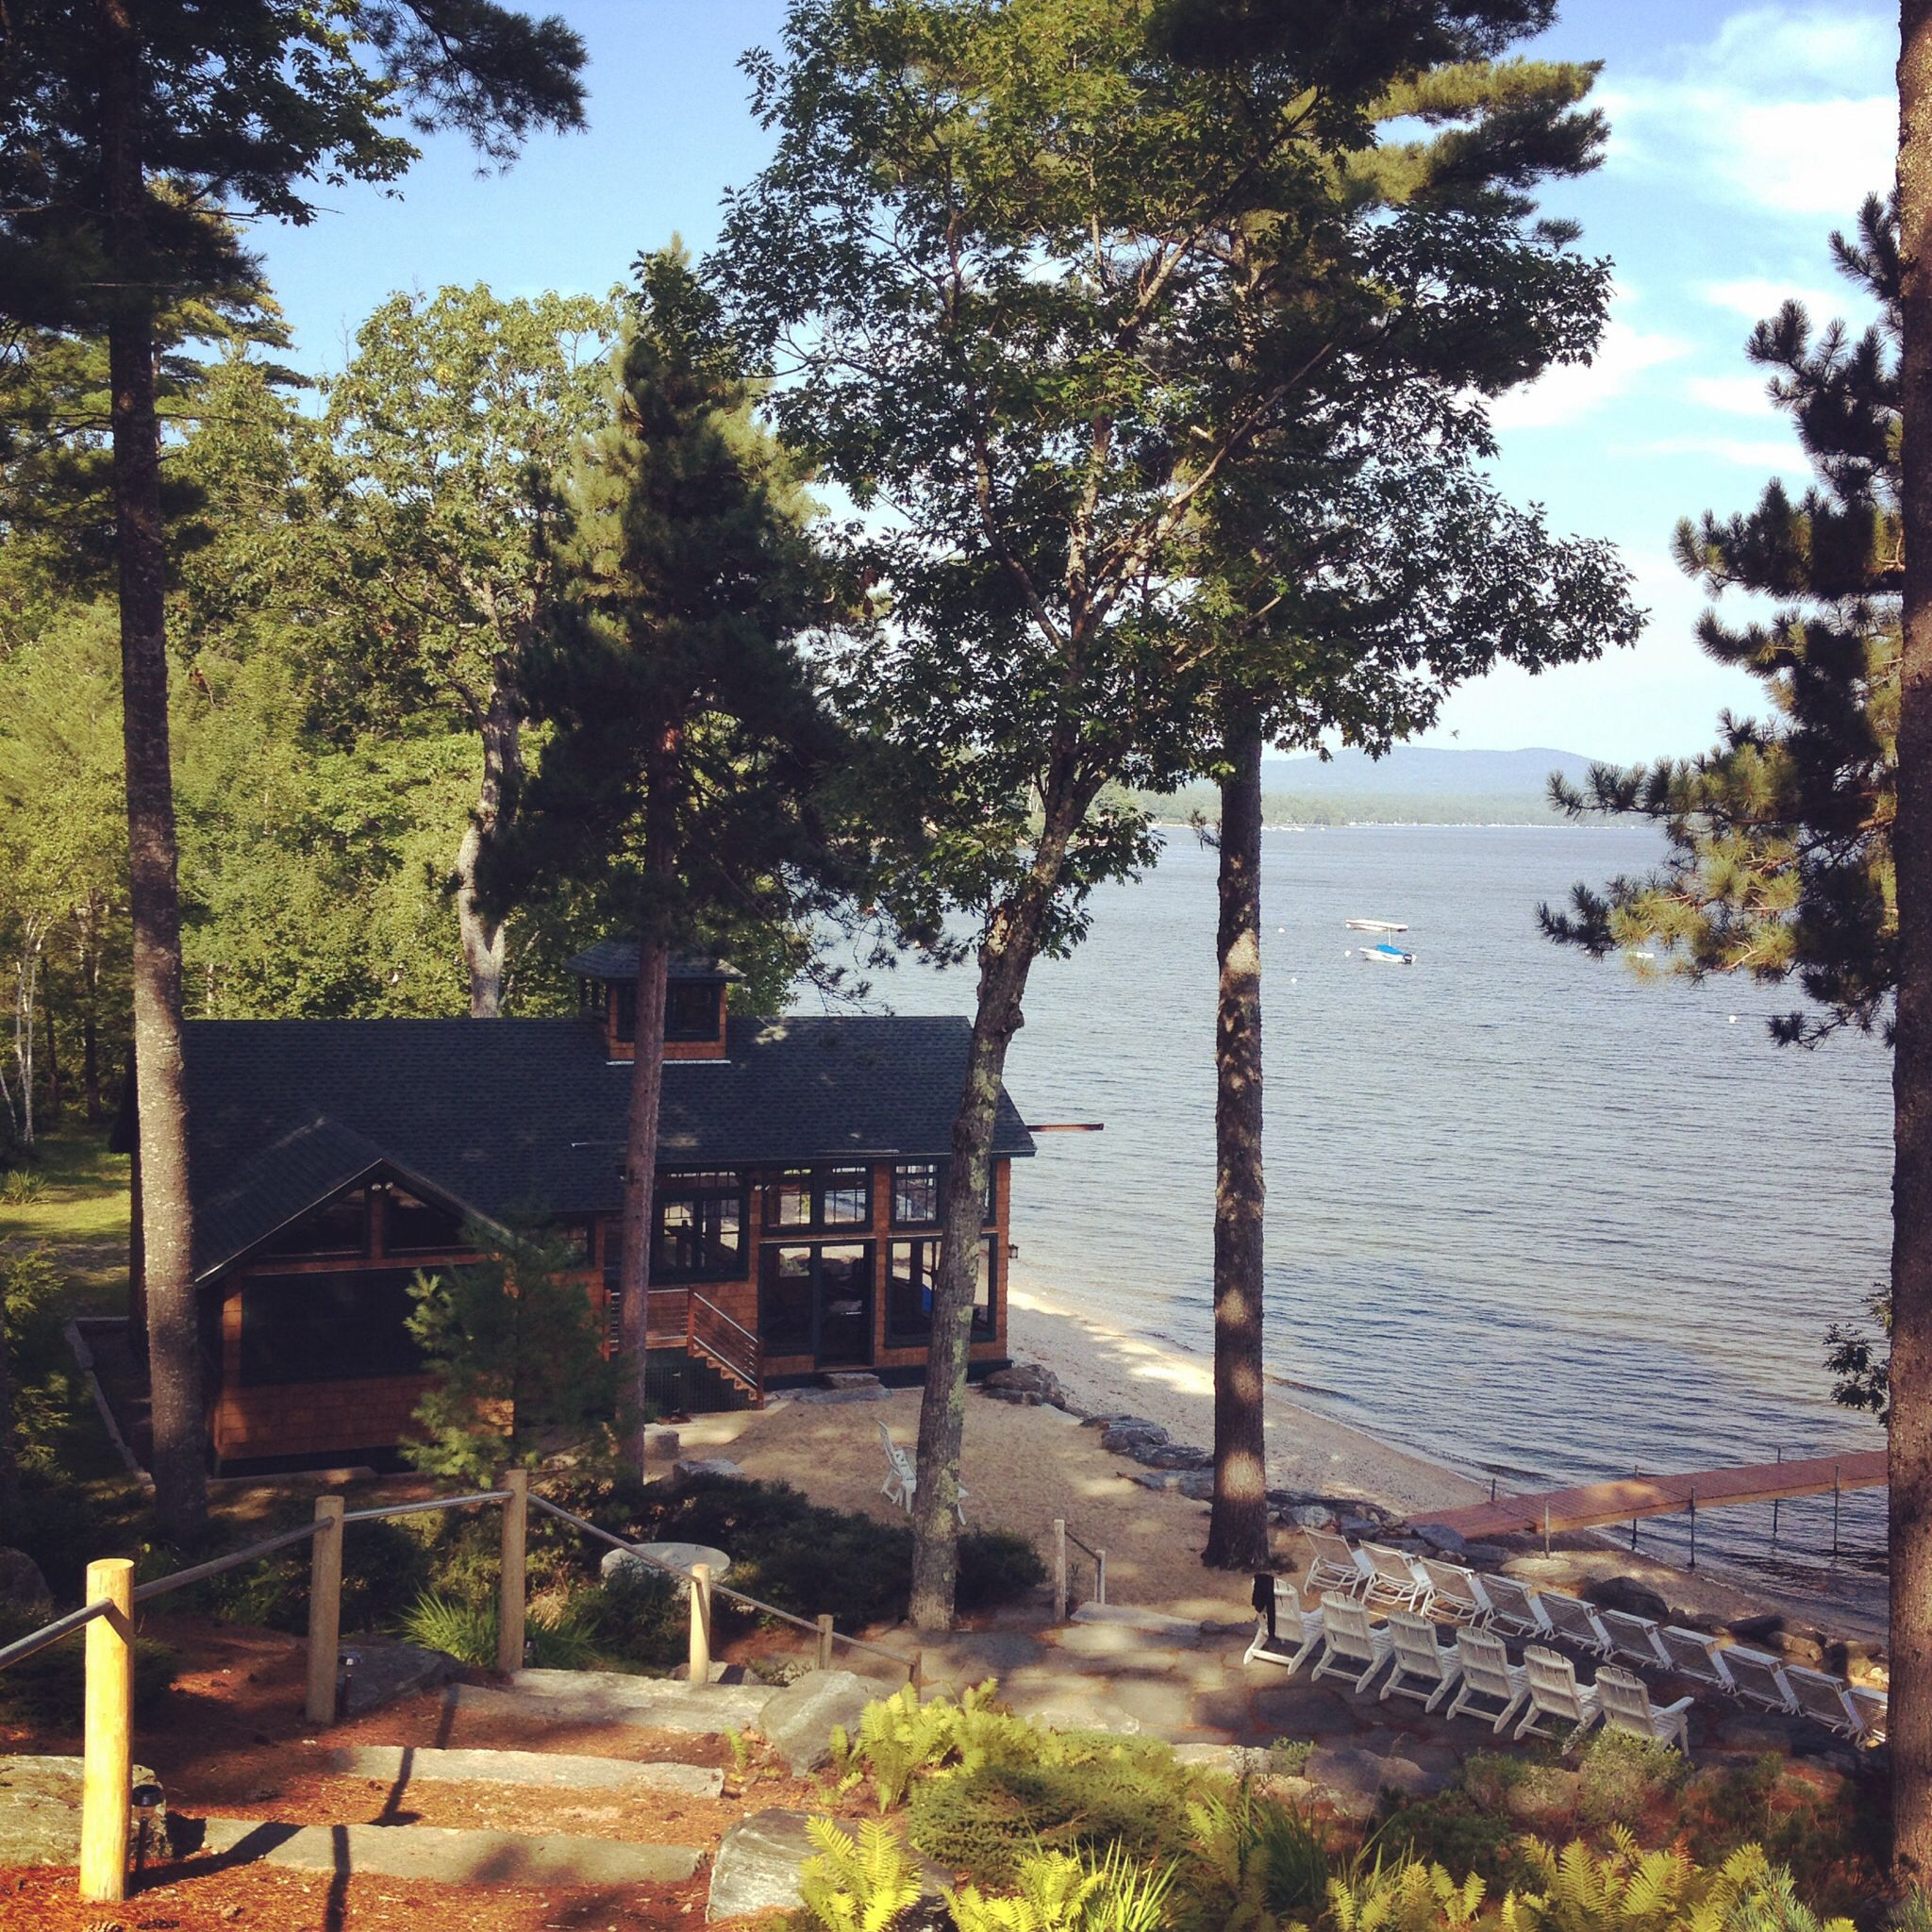 Boat House Sunningdale Lodge Sebago Lake Maine Lodges Wedding Venues